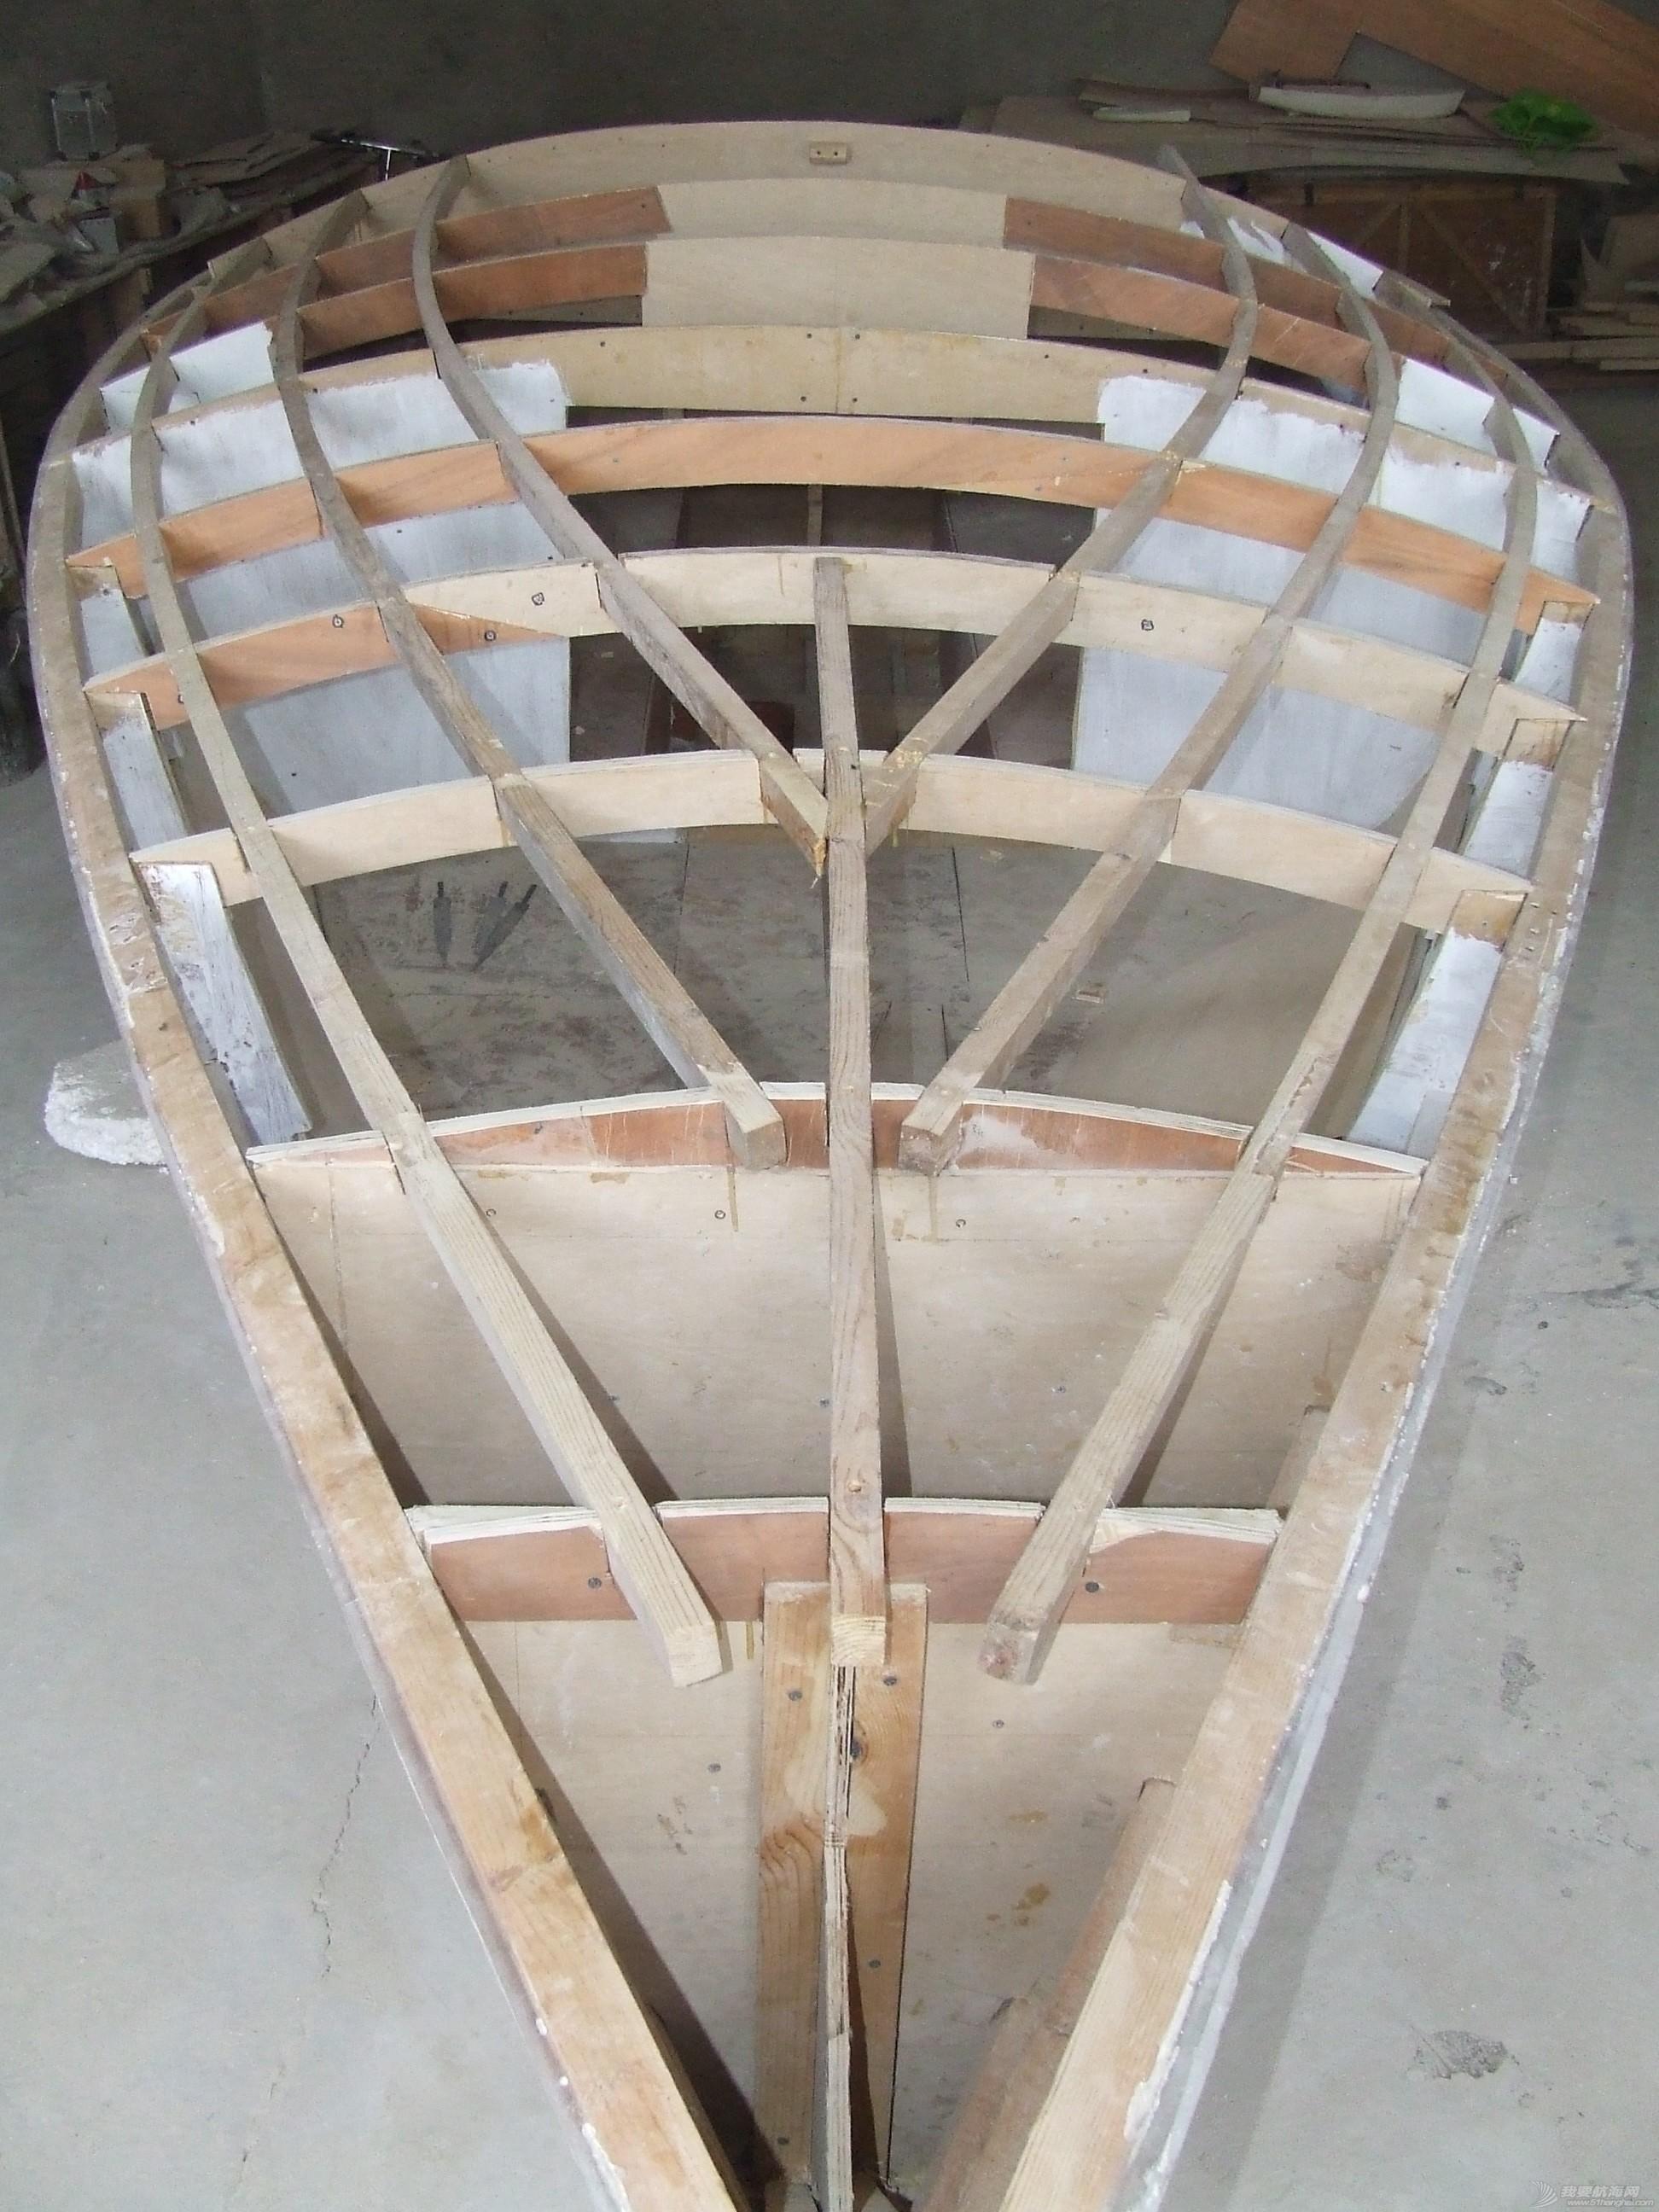 GR-750舱面面板铺装完毕 DSCF5820.JPG